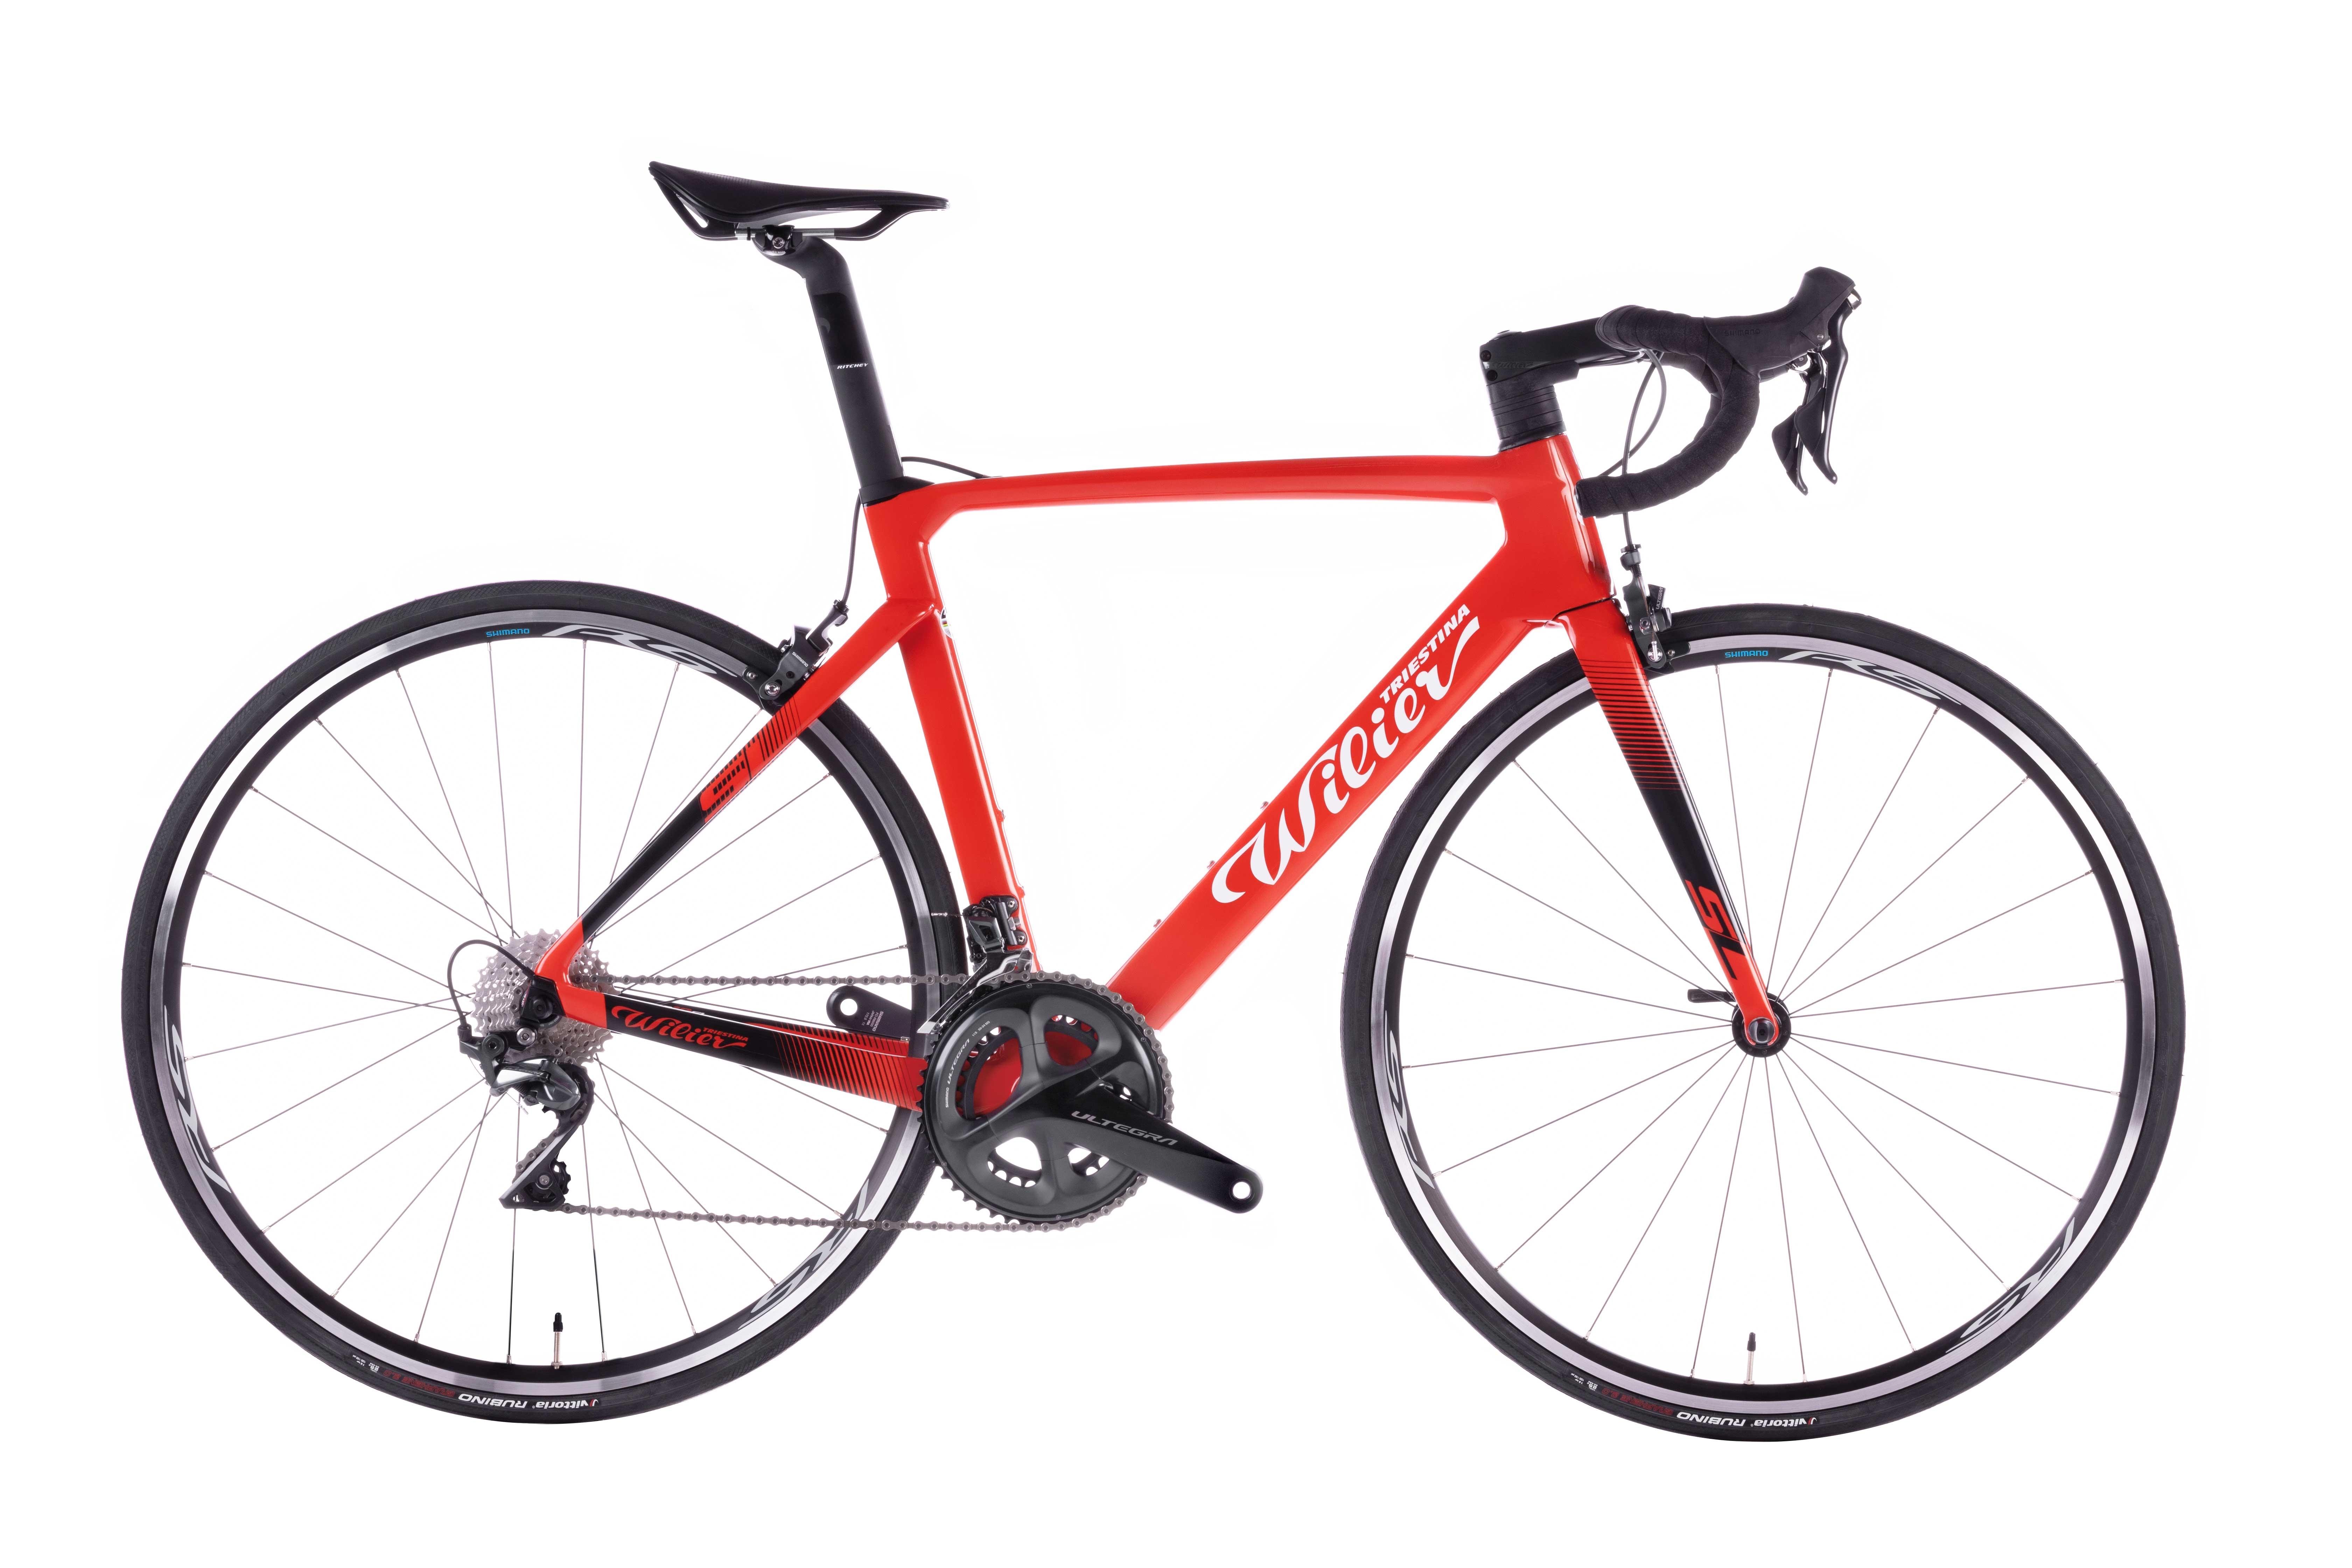 kolo CENTO10 SL Rim+ULTEGRA + RS100 red black  L